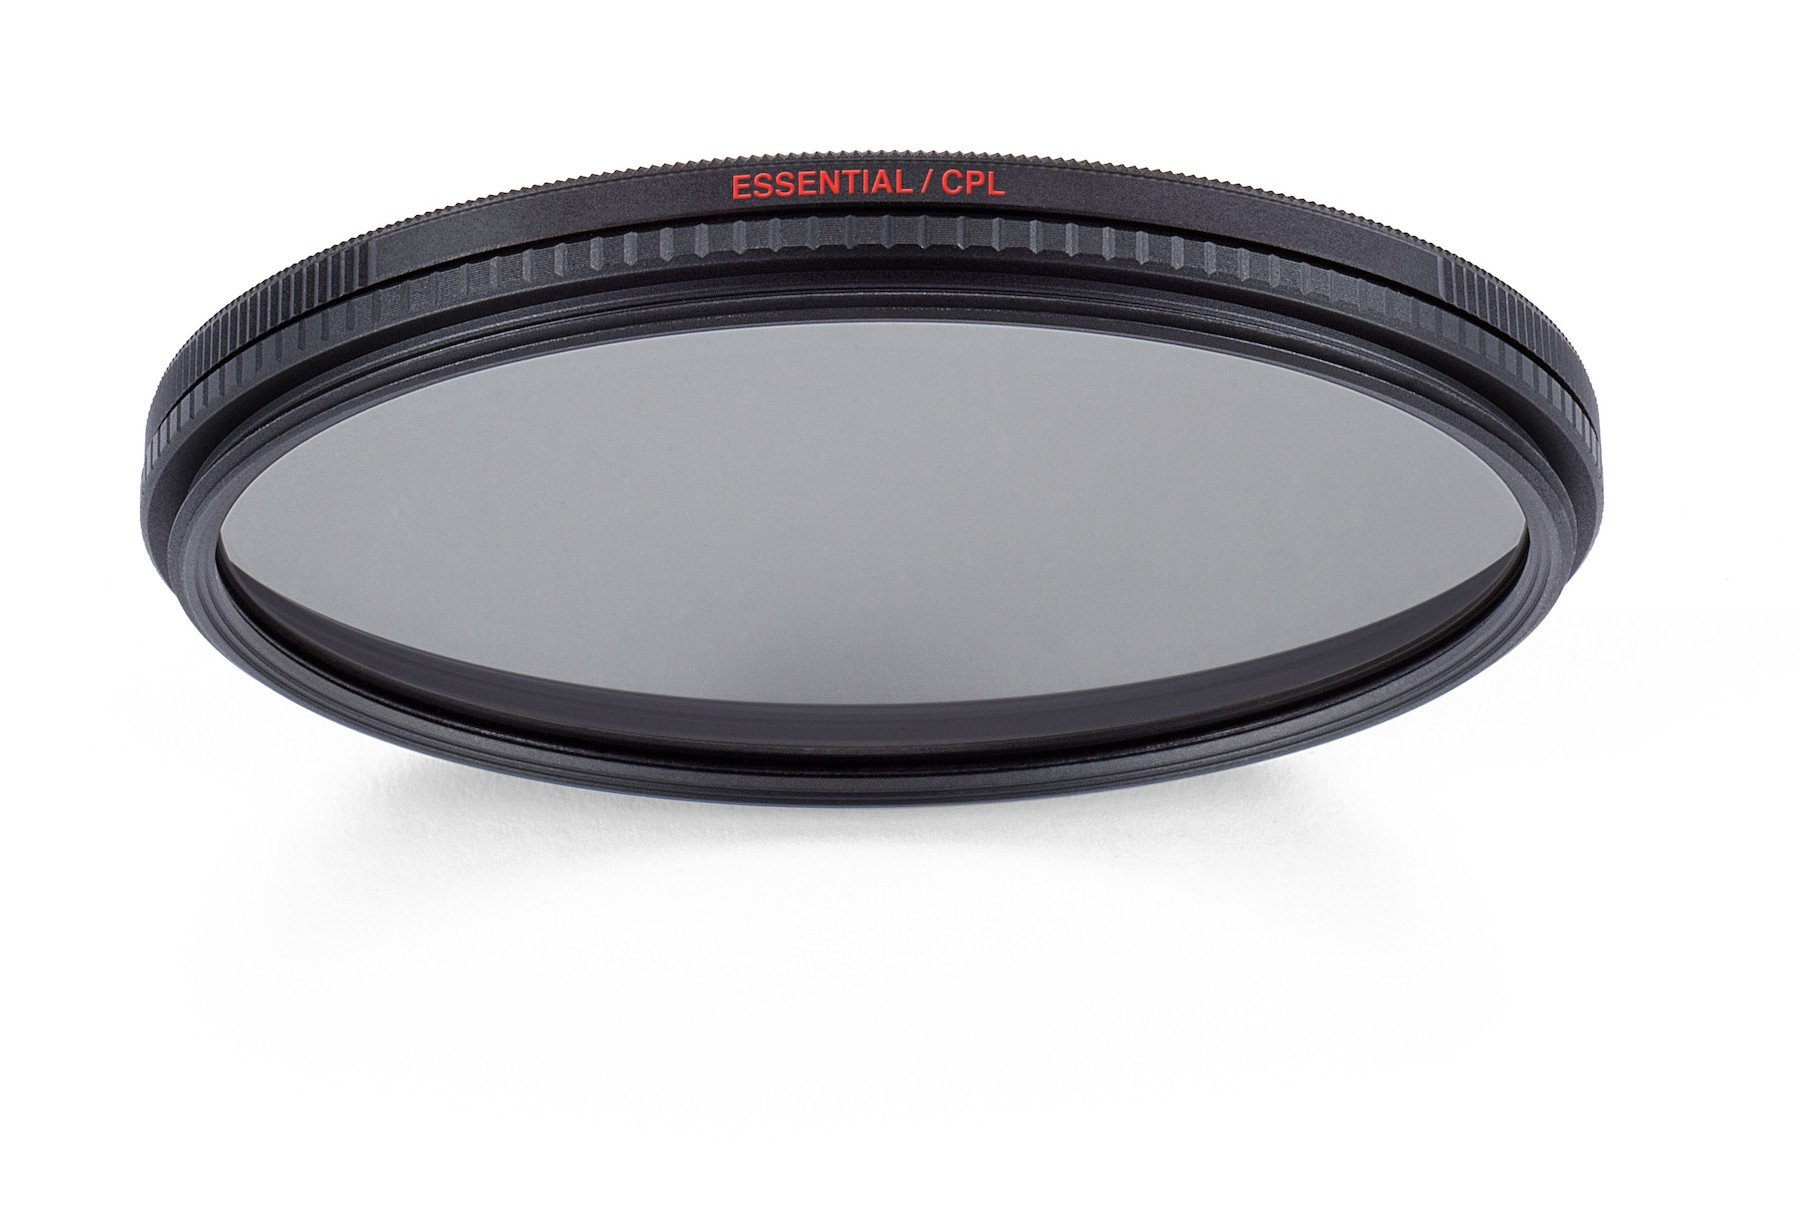 62mm Essential Circular Polarizing Filter